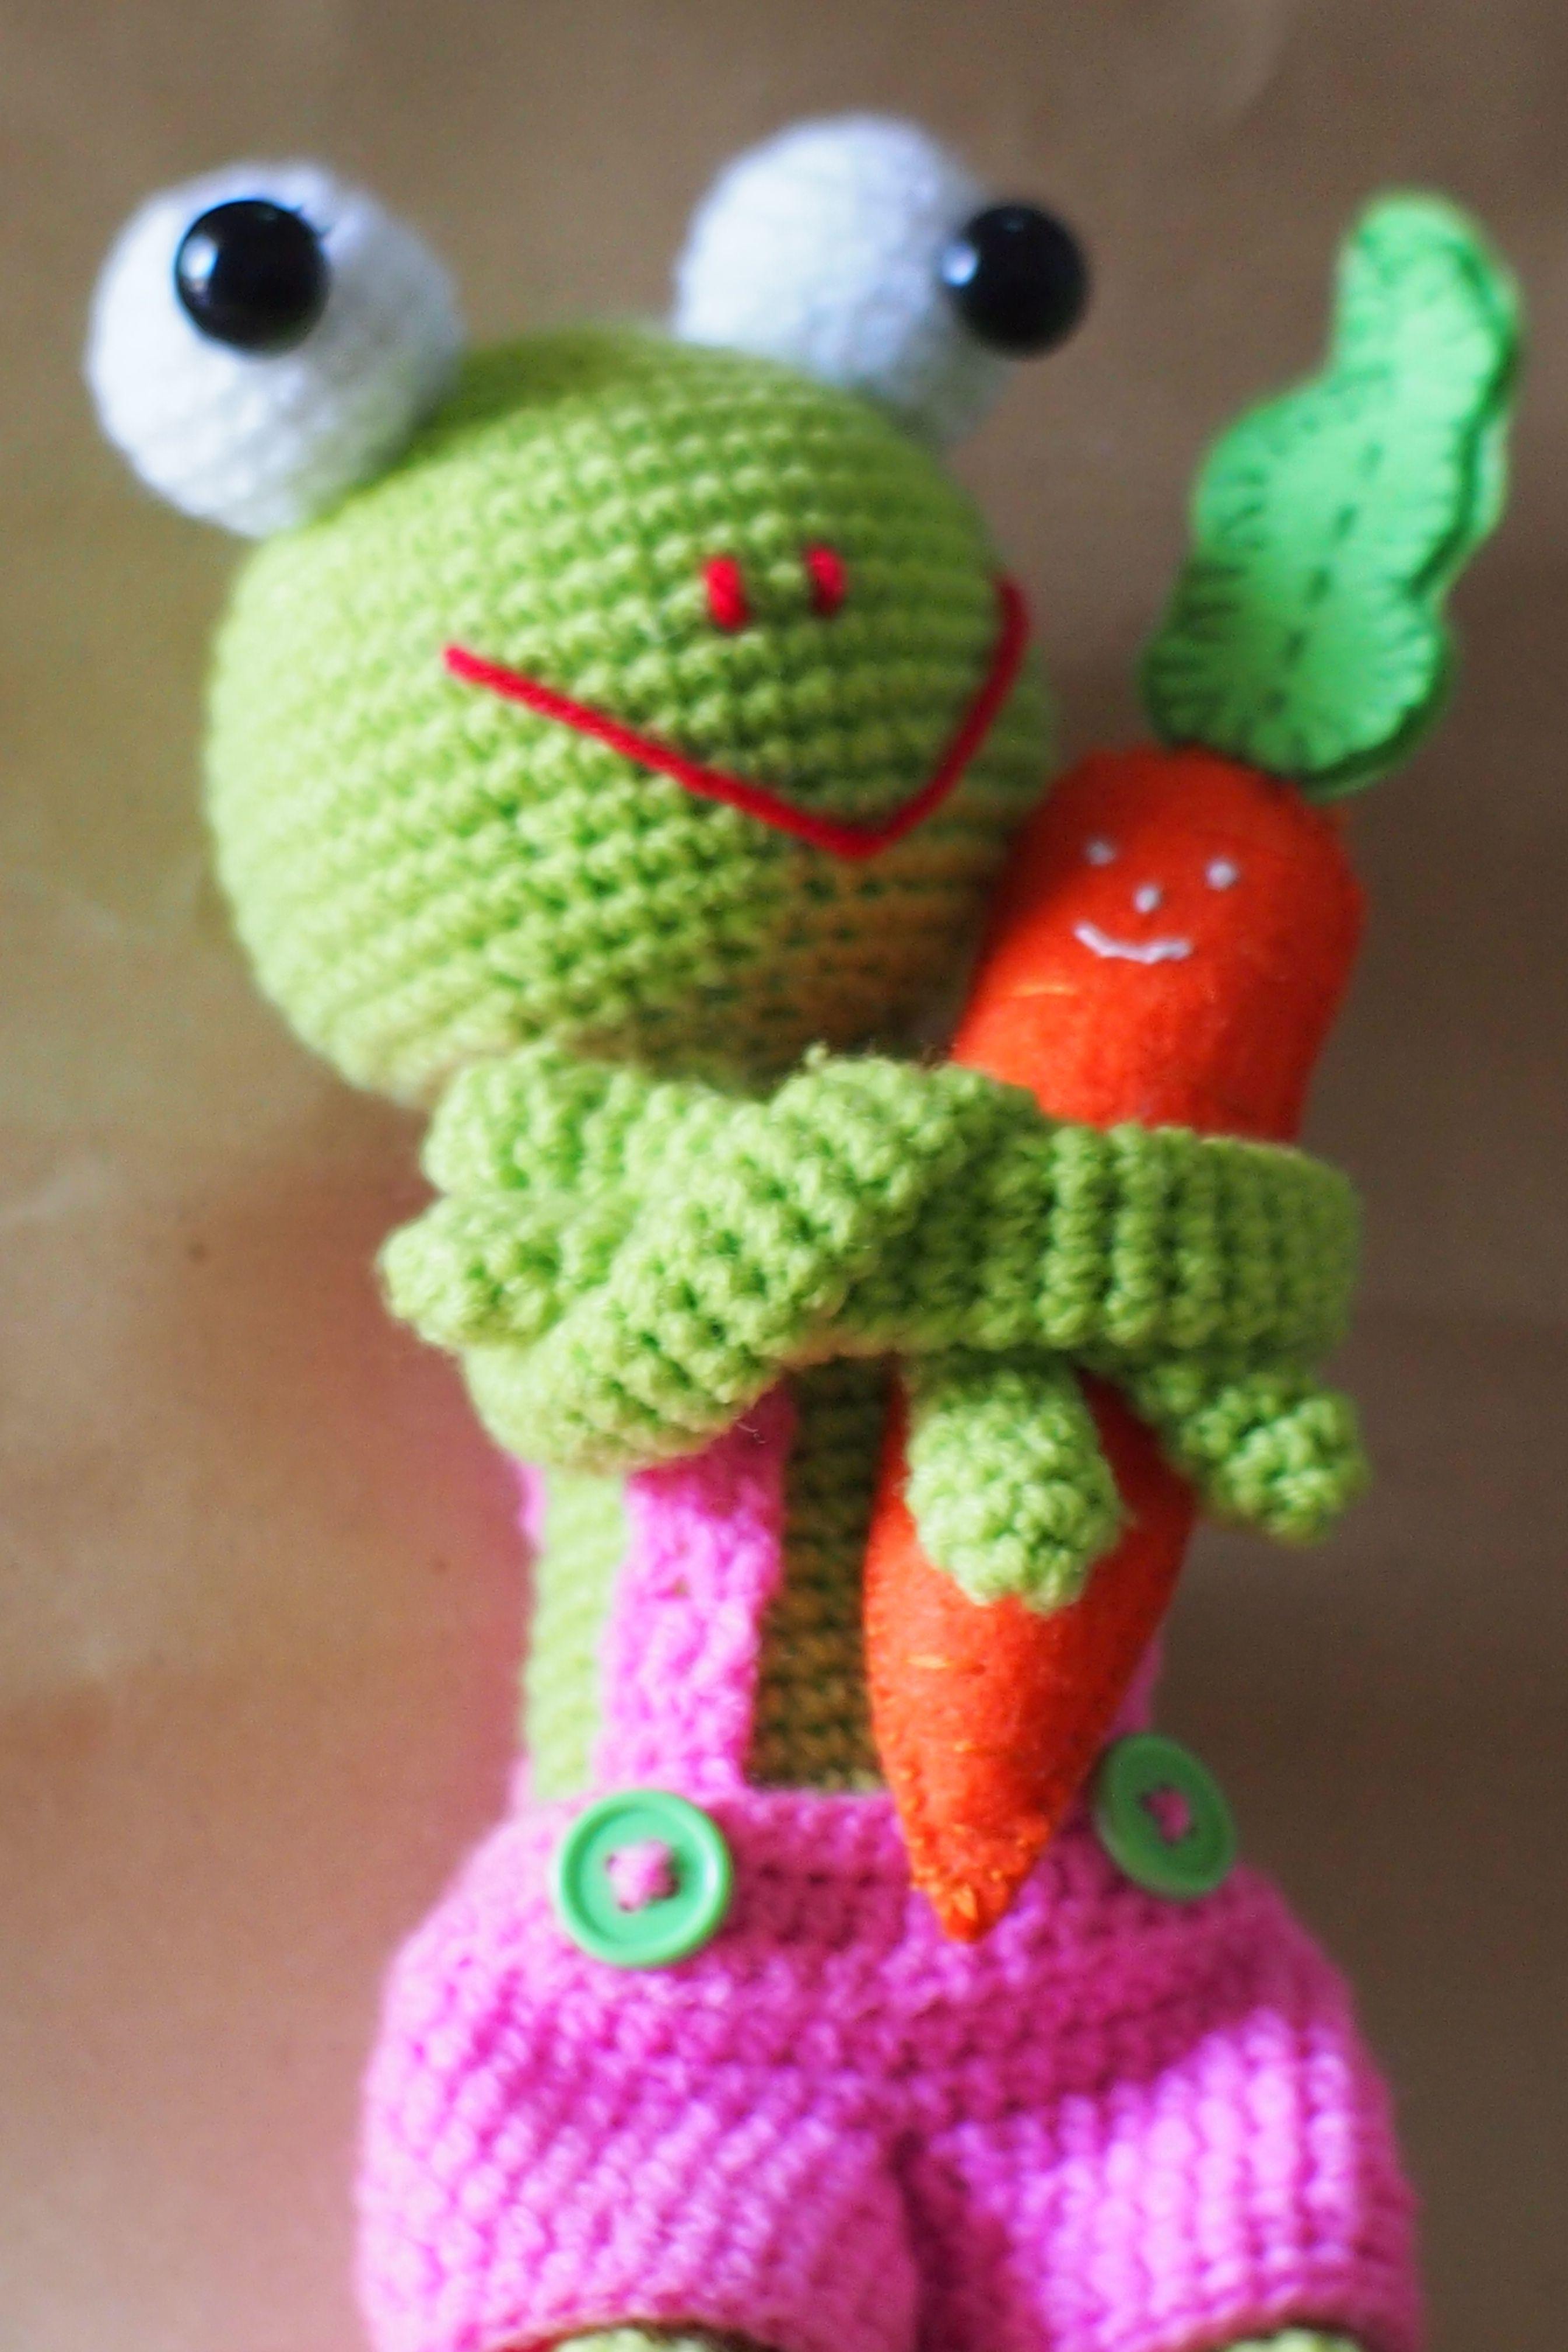 Crochet doll | ♥ Amigurumi!! ♥ Community Board | Pinterest ...